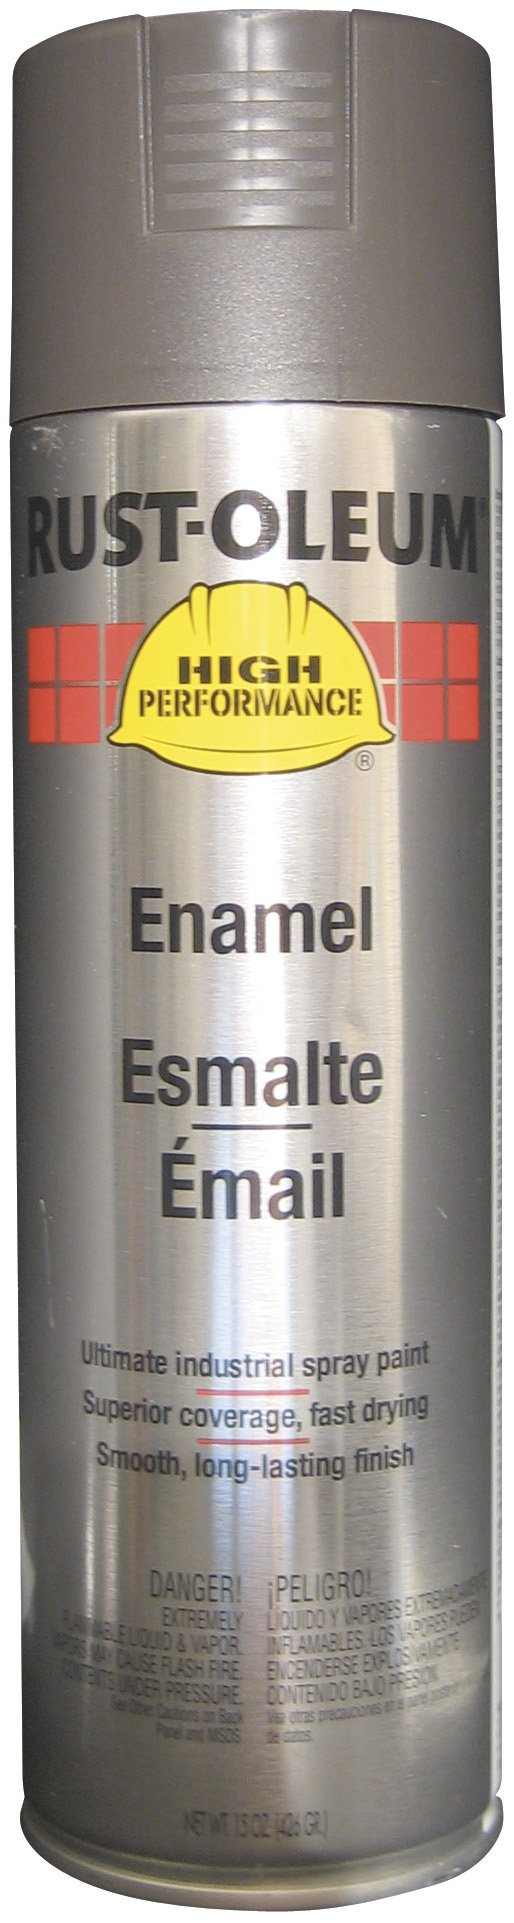 Rust-Oleum 209565 V2100 System Enamel Spray Paint, 15-Ounce, Anodized Bronze by Rust-Oleum